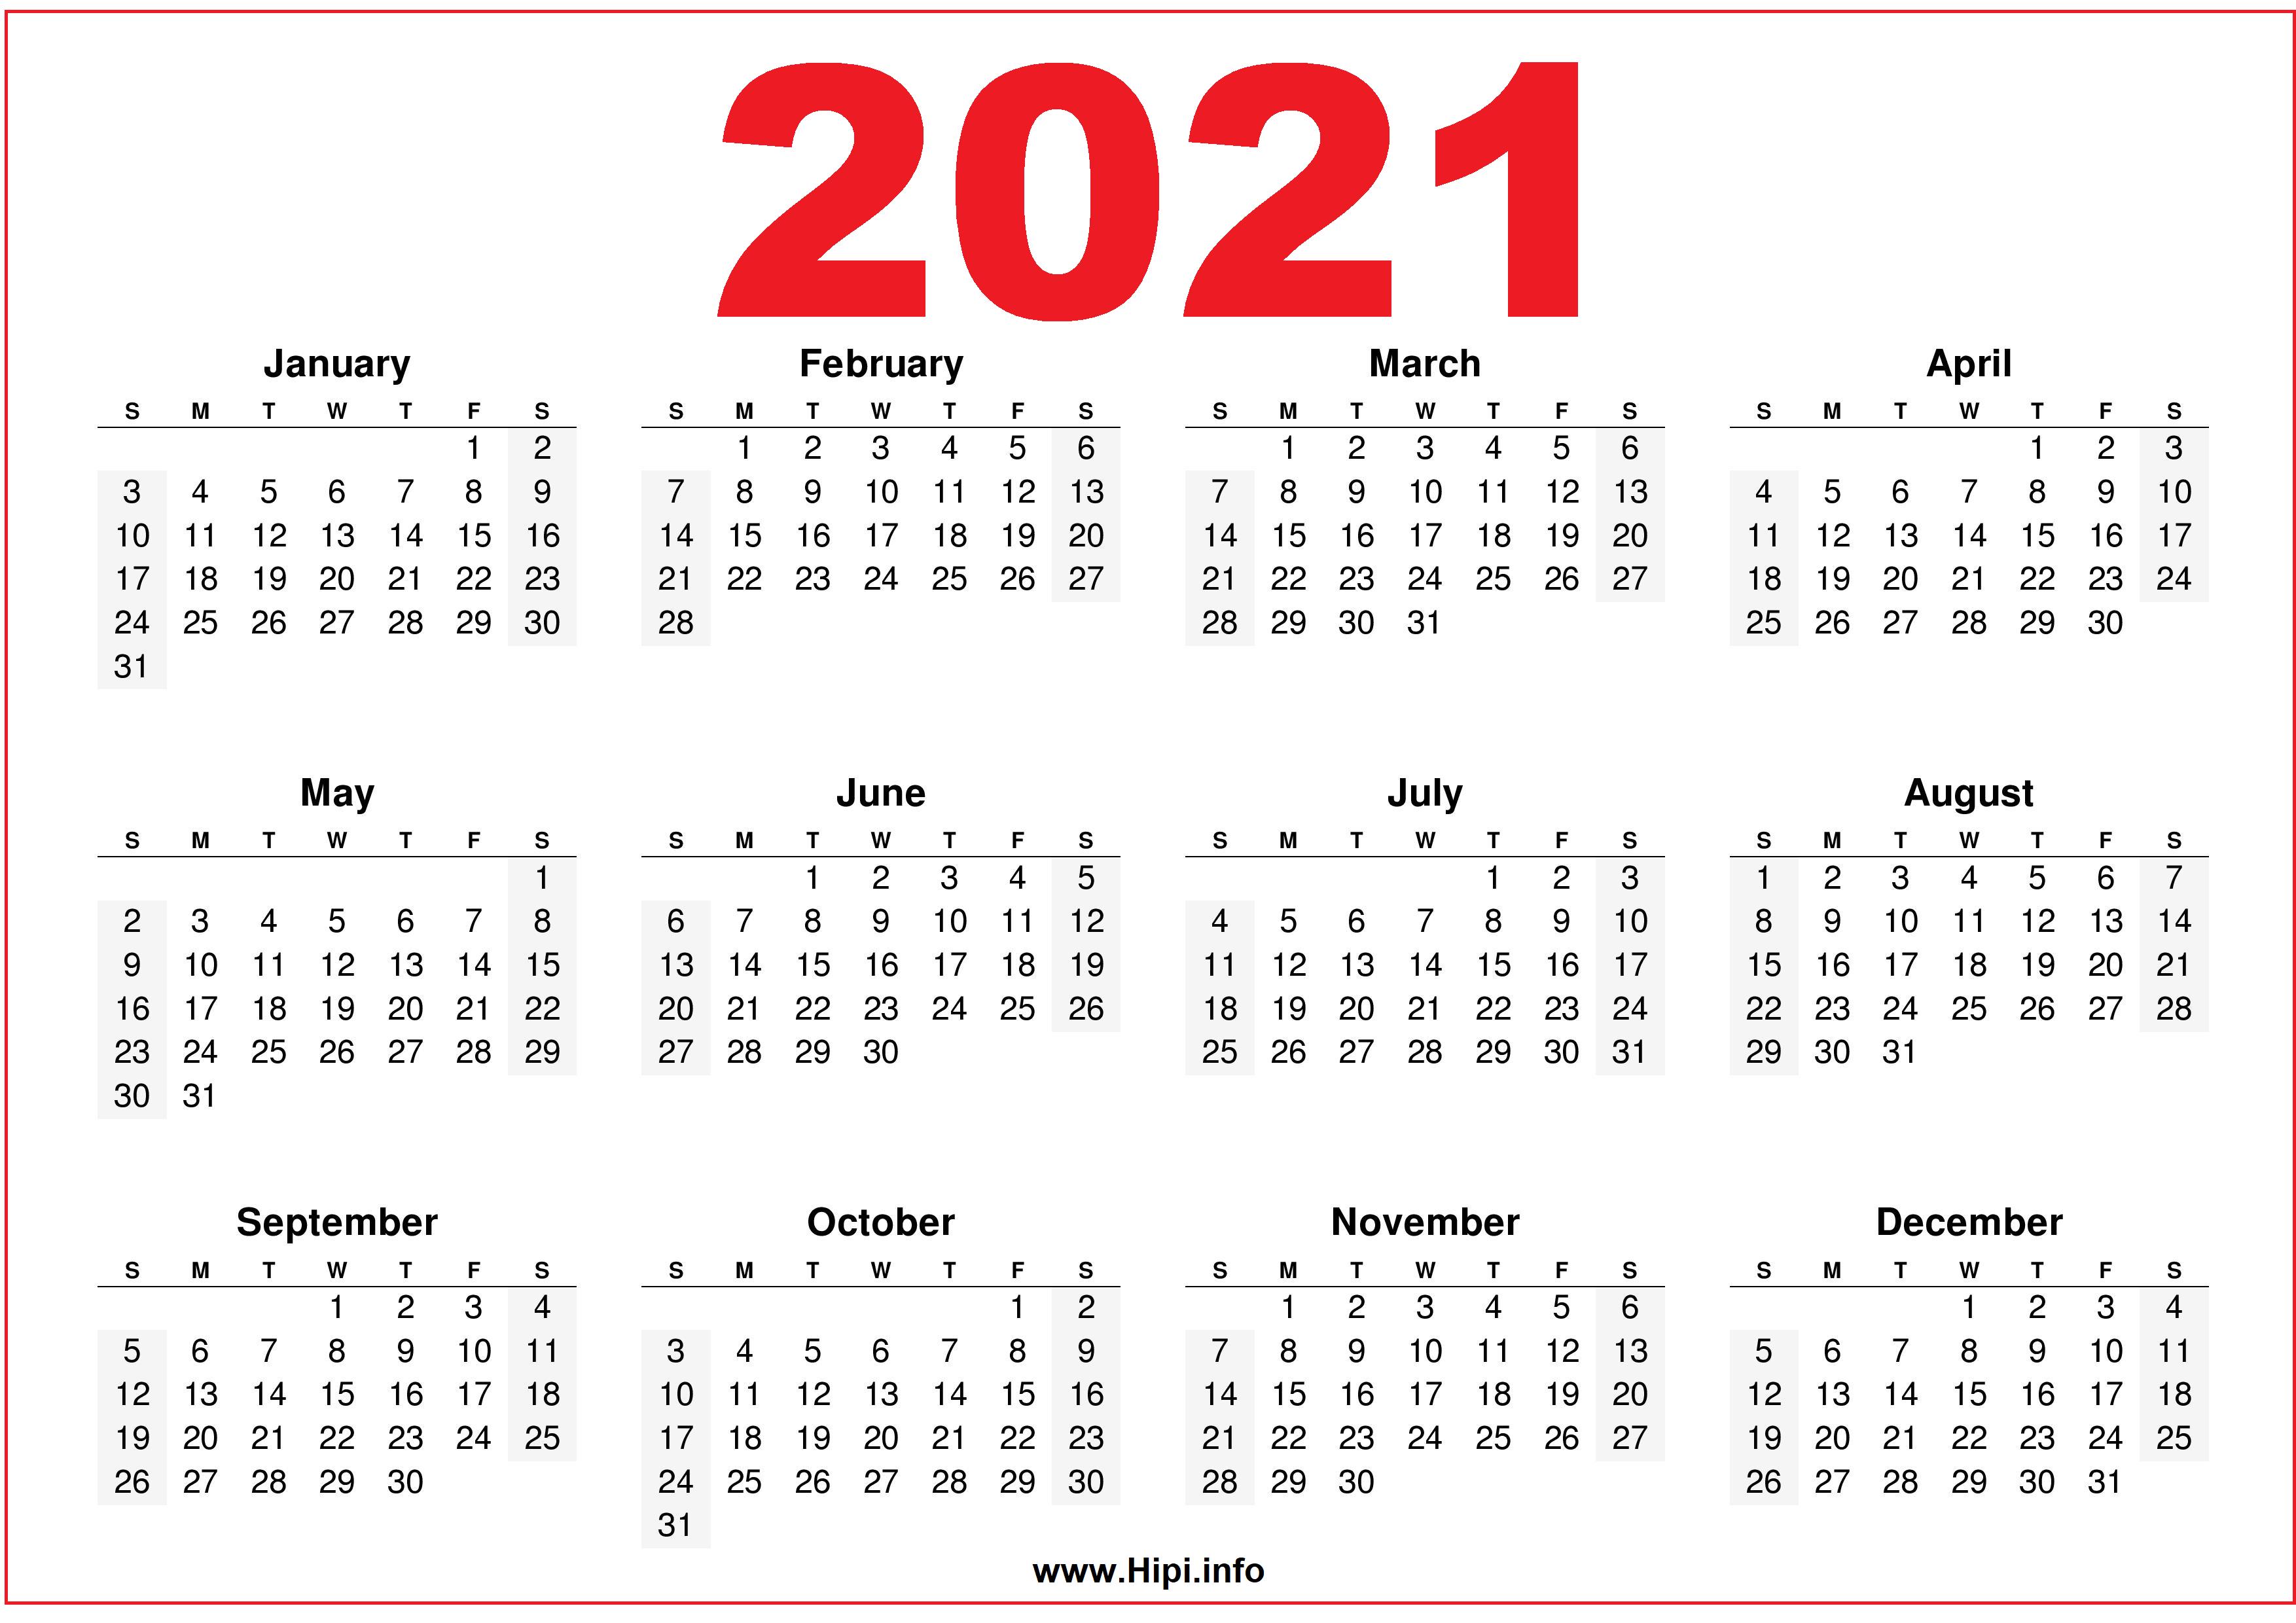 Free Printable Downloadable 2021 Calendars - Hipi.info